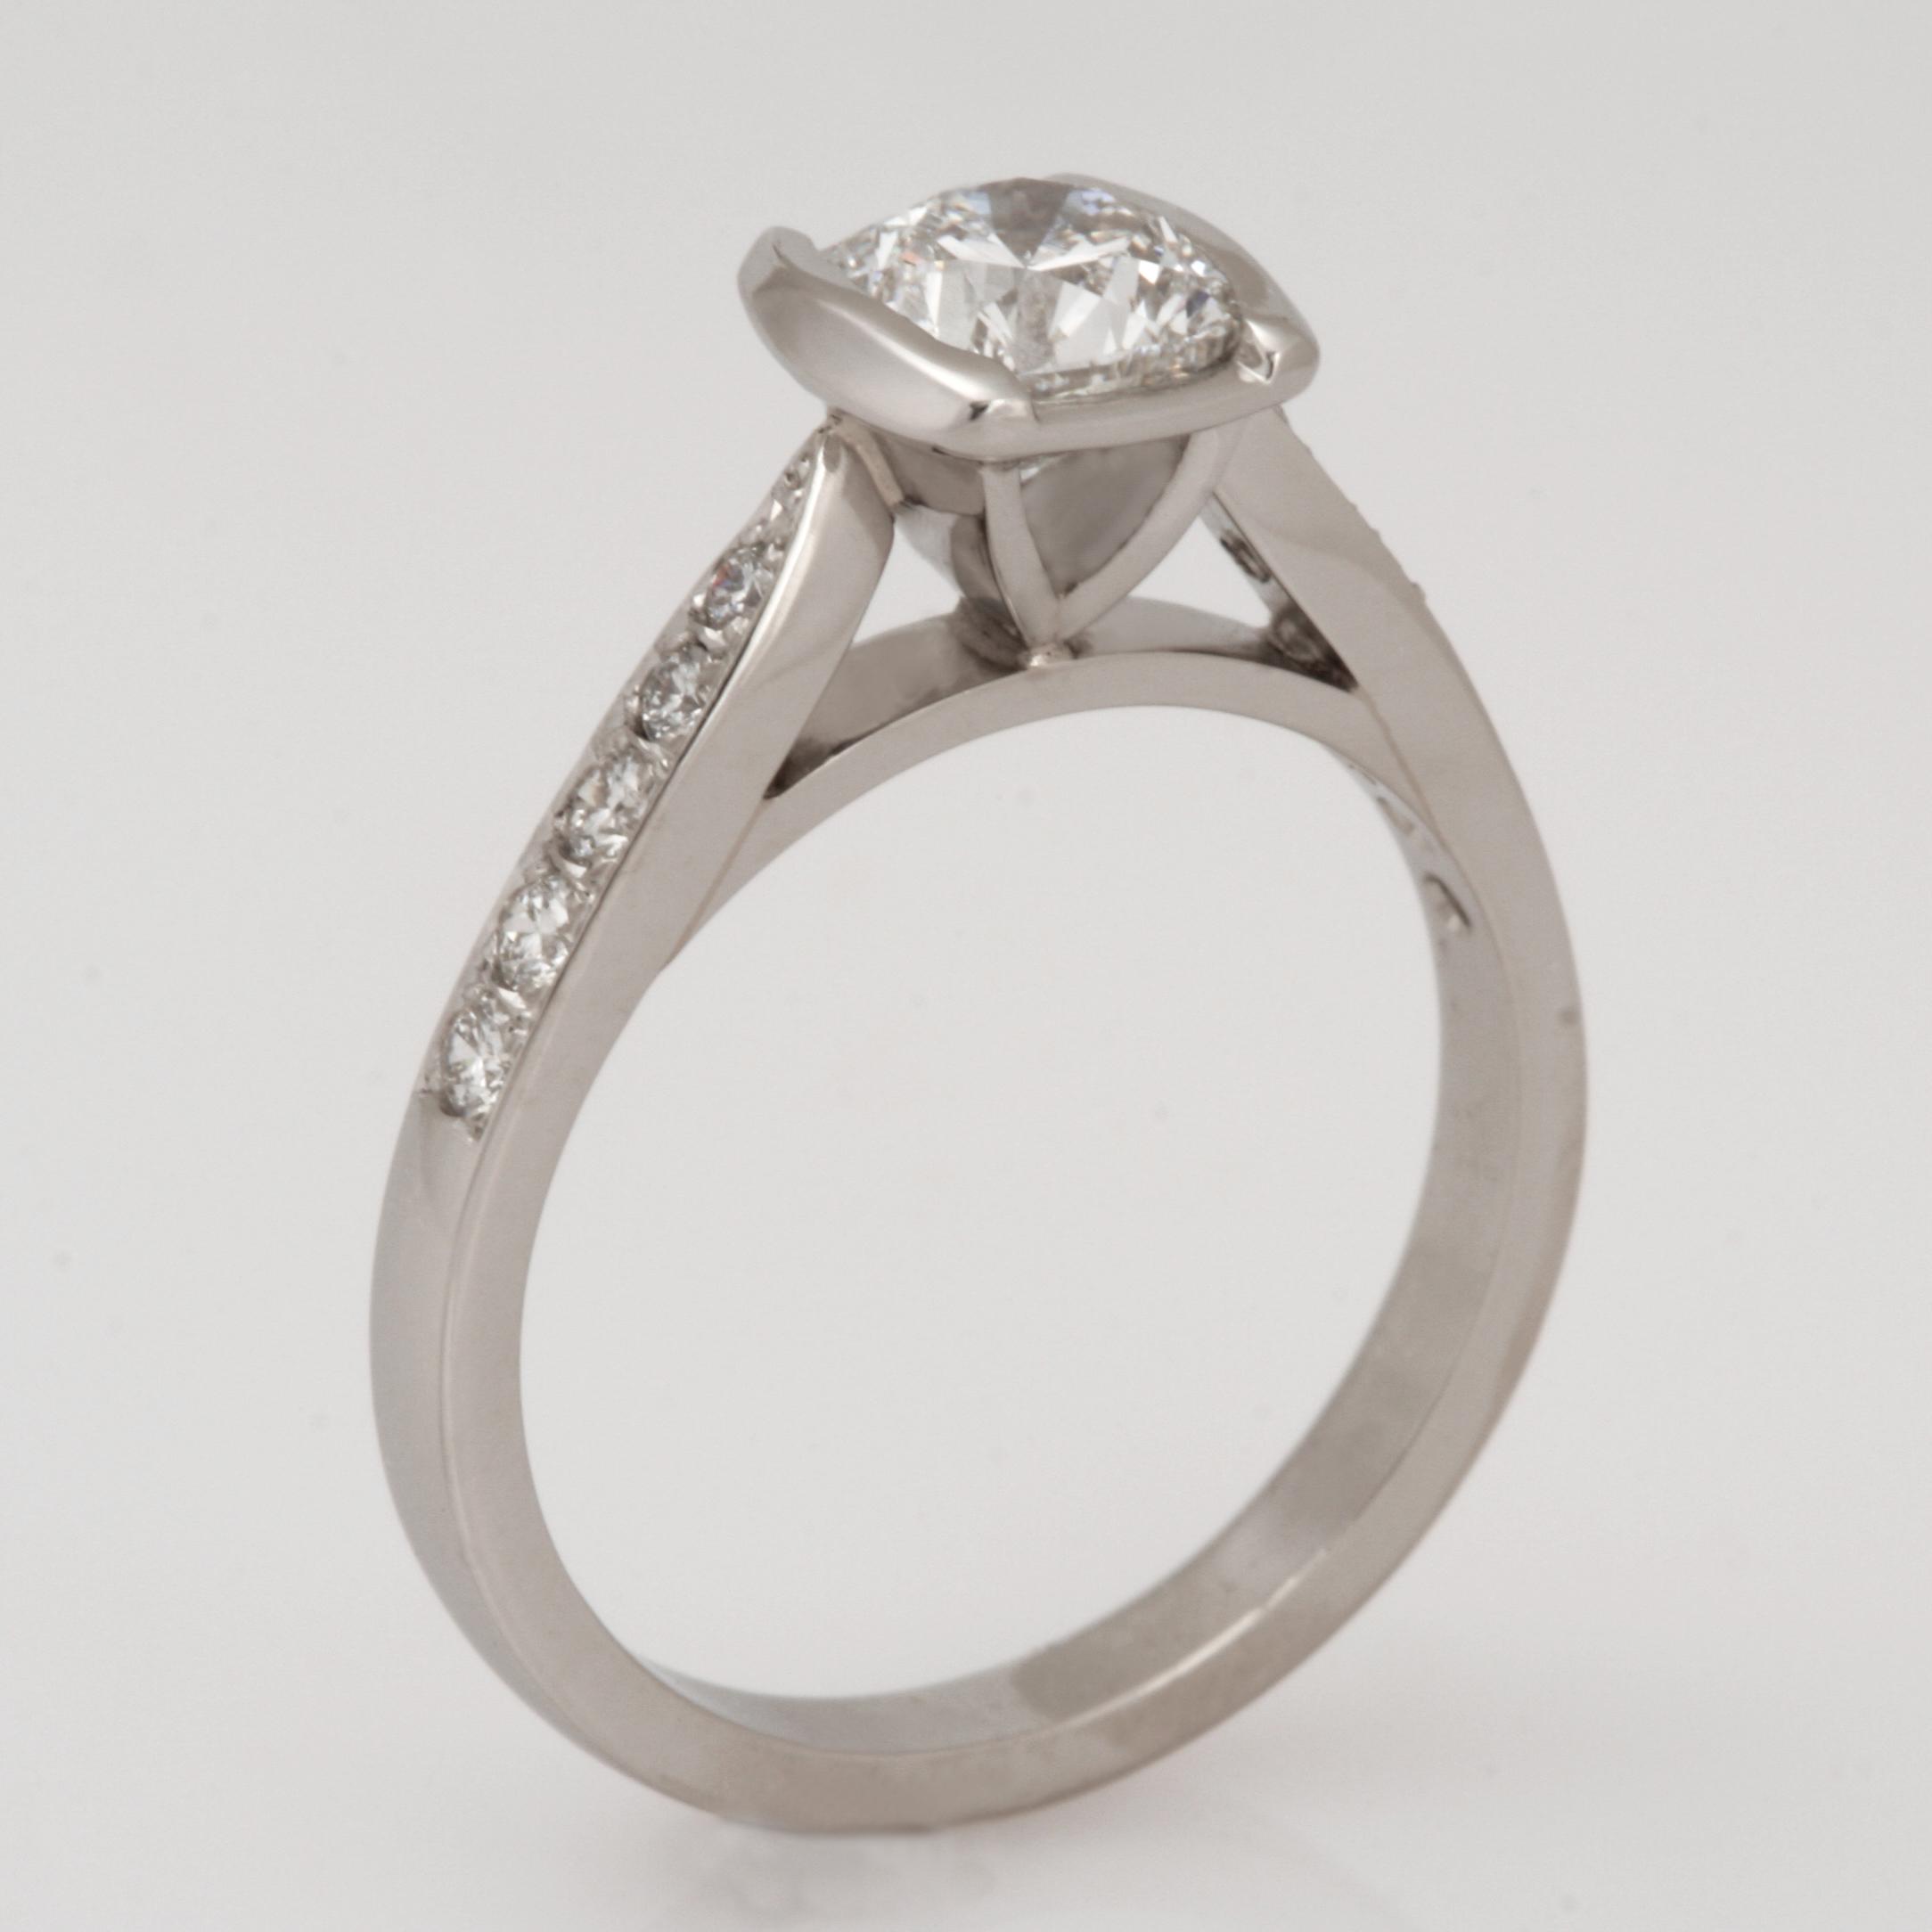 Handmade ladies platinum square cushion cut diamond engagement ring.